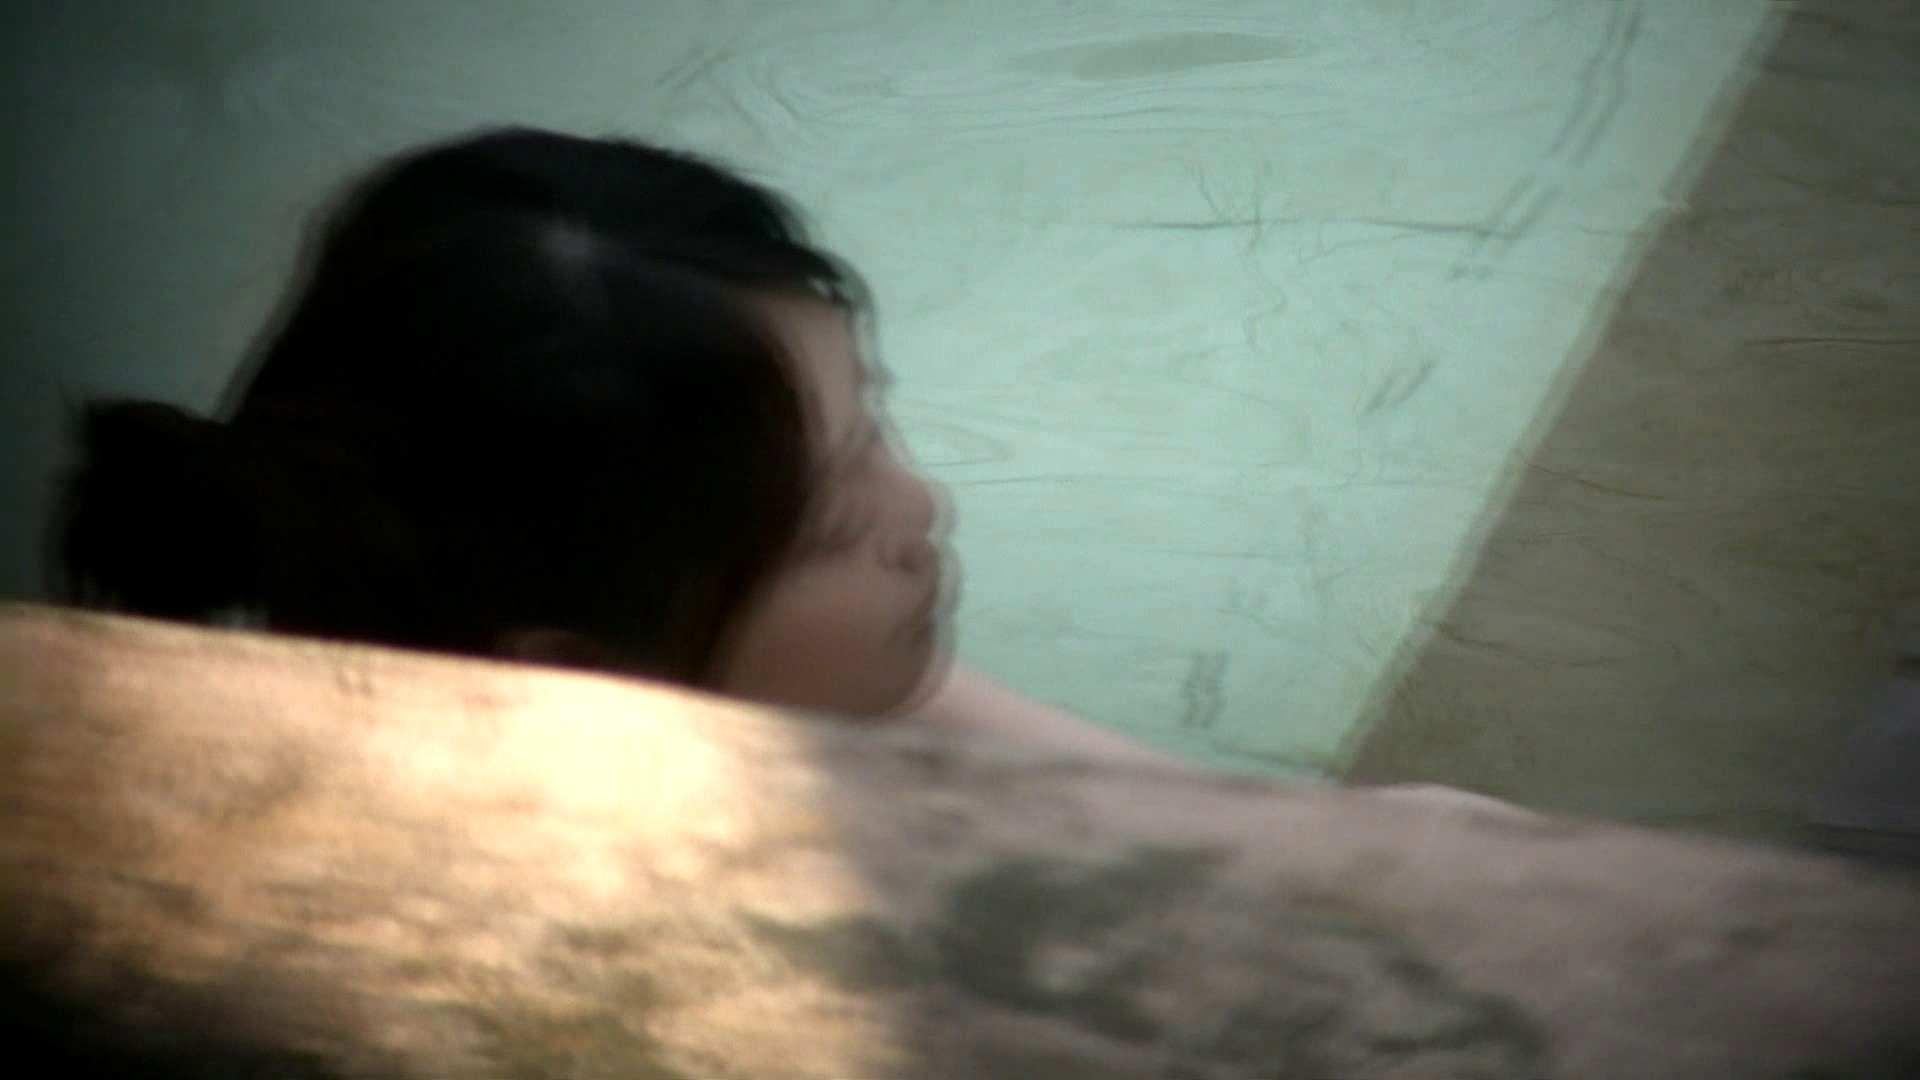 Aquaな露天風呂Vol.652 露天風呂突入   盗撮師作品  79pic 19